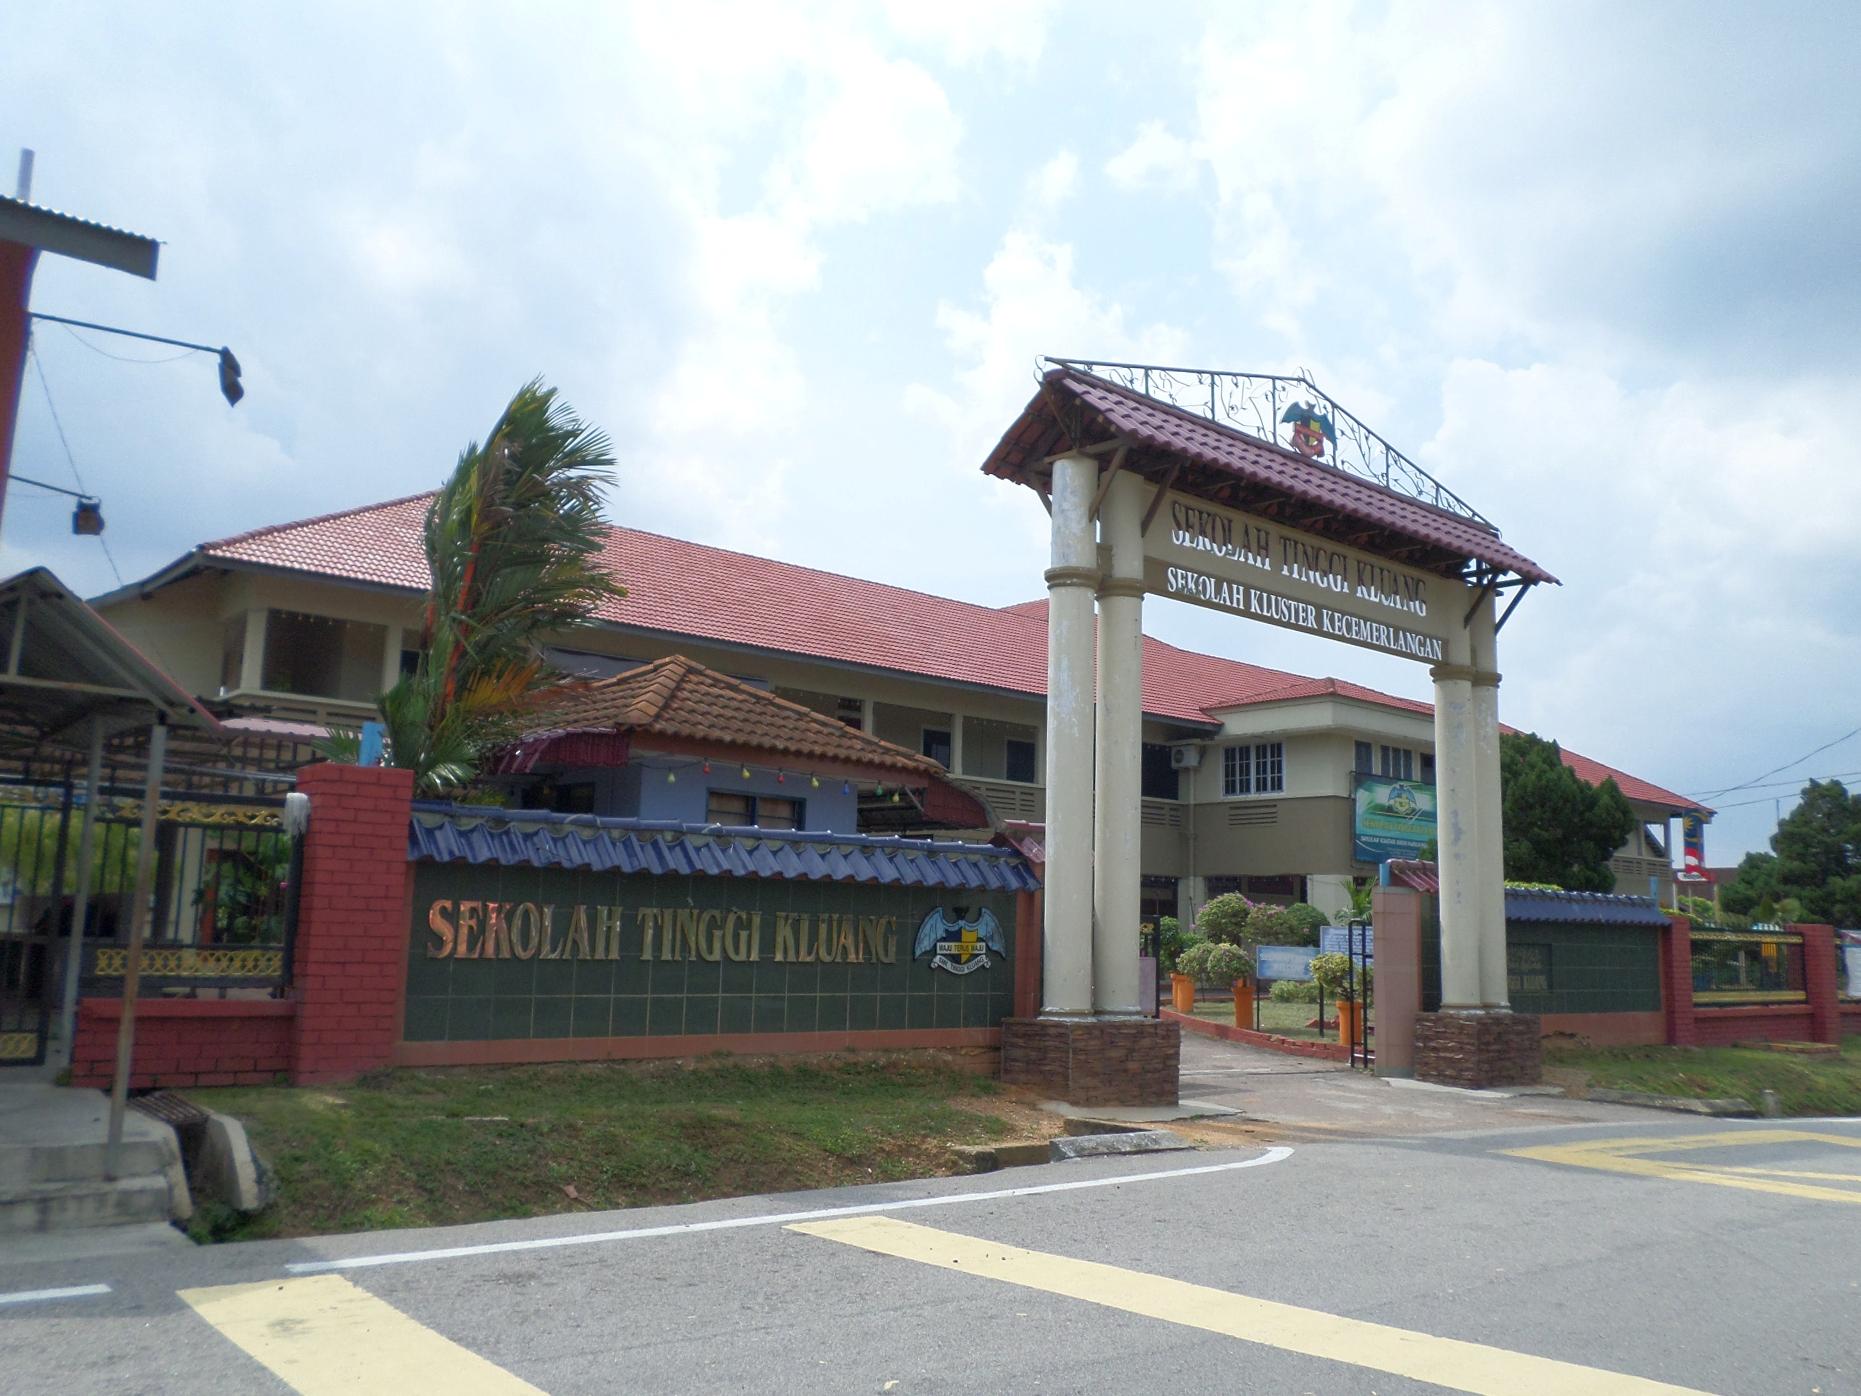 Sekolah Tinggi Kluang Wikipedia Bahasa Melayu Ensiklopedia Bebas